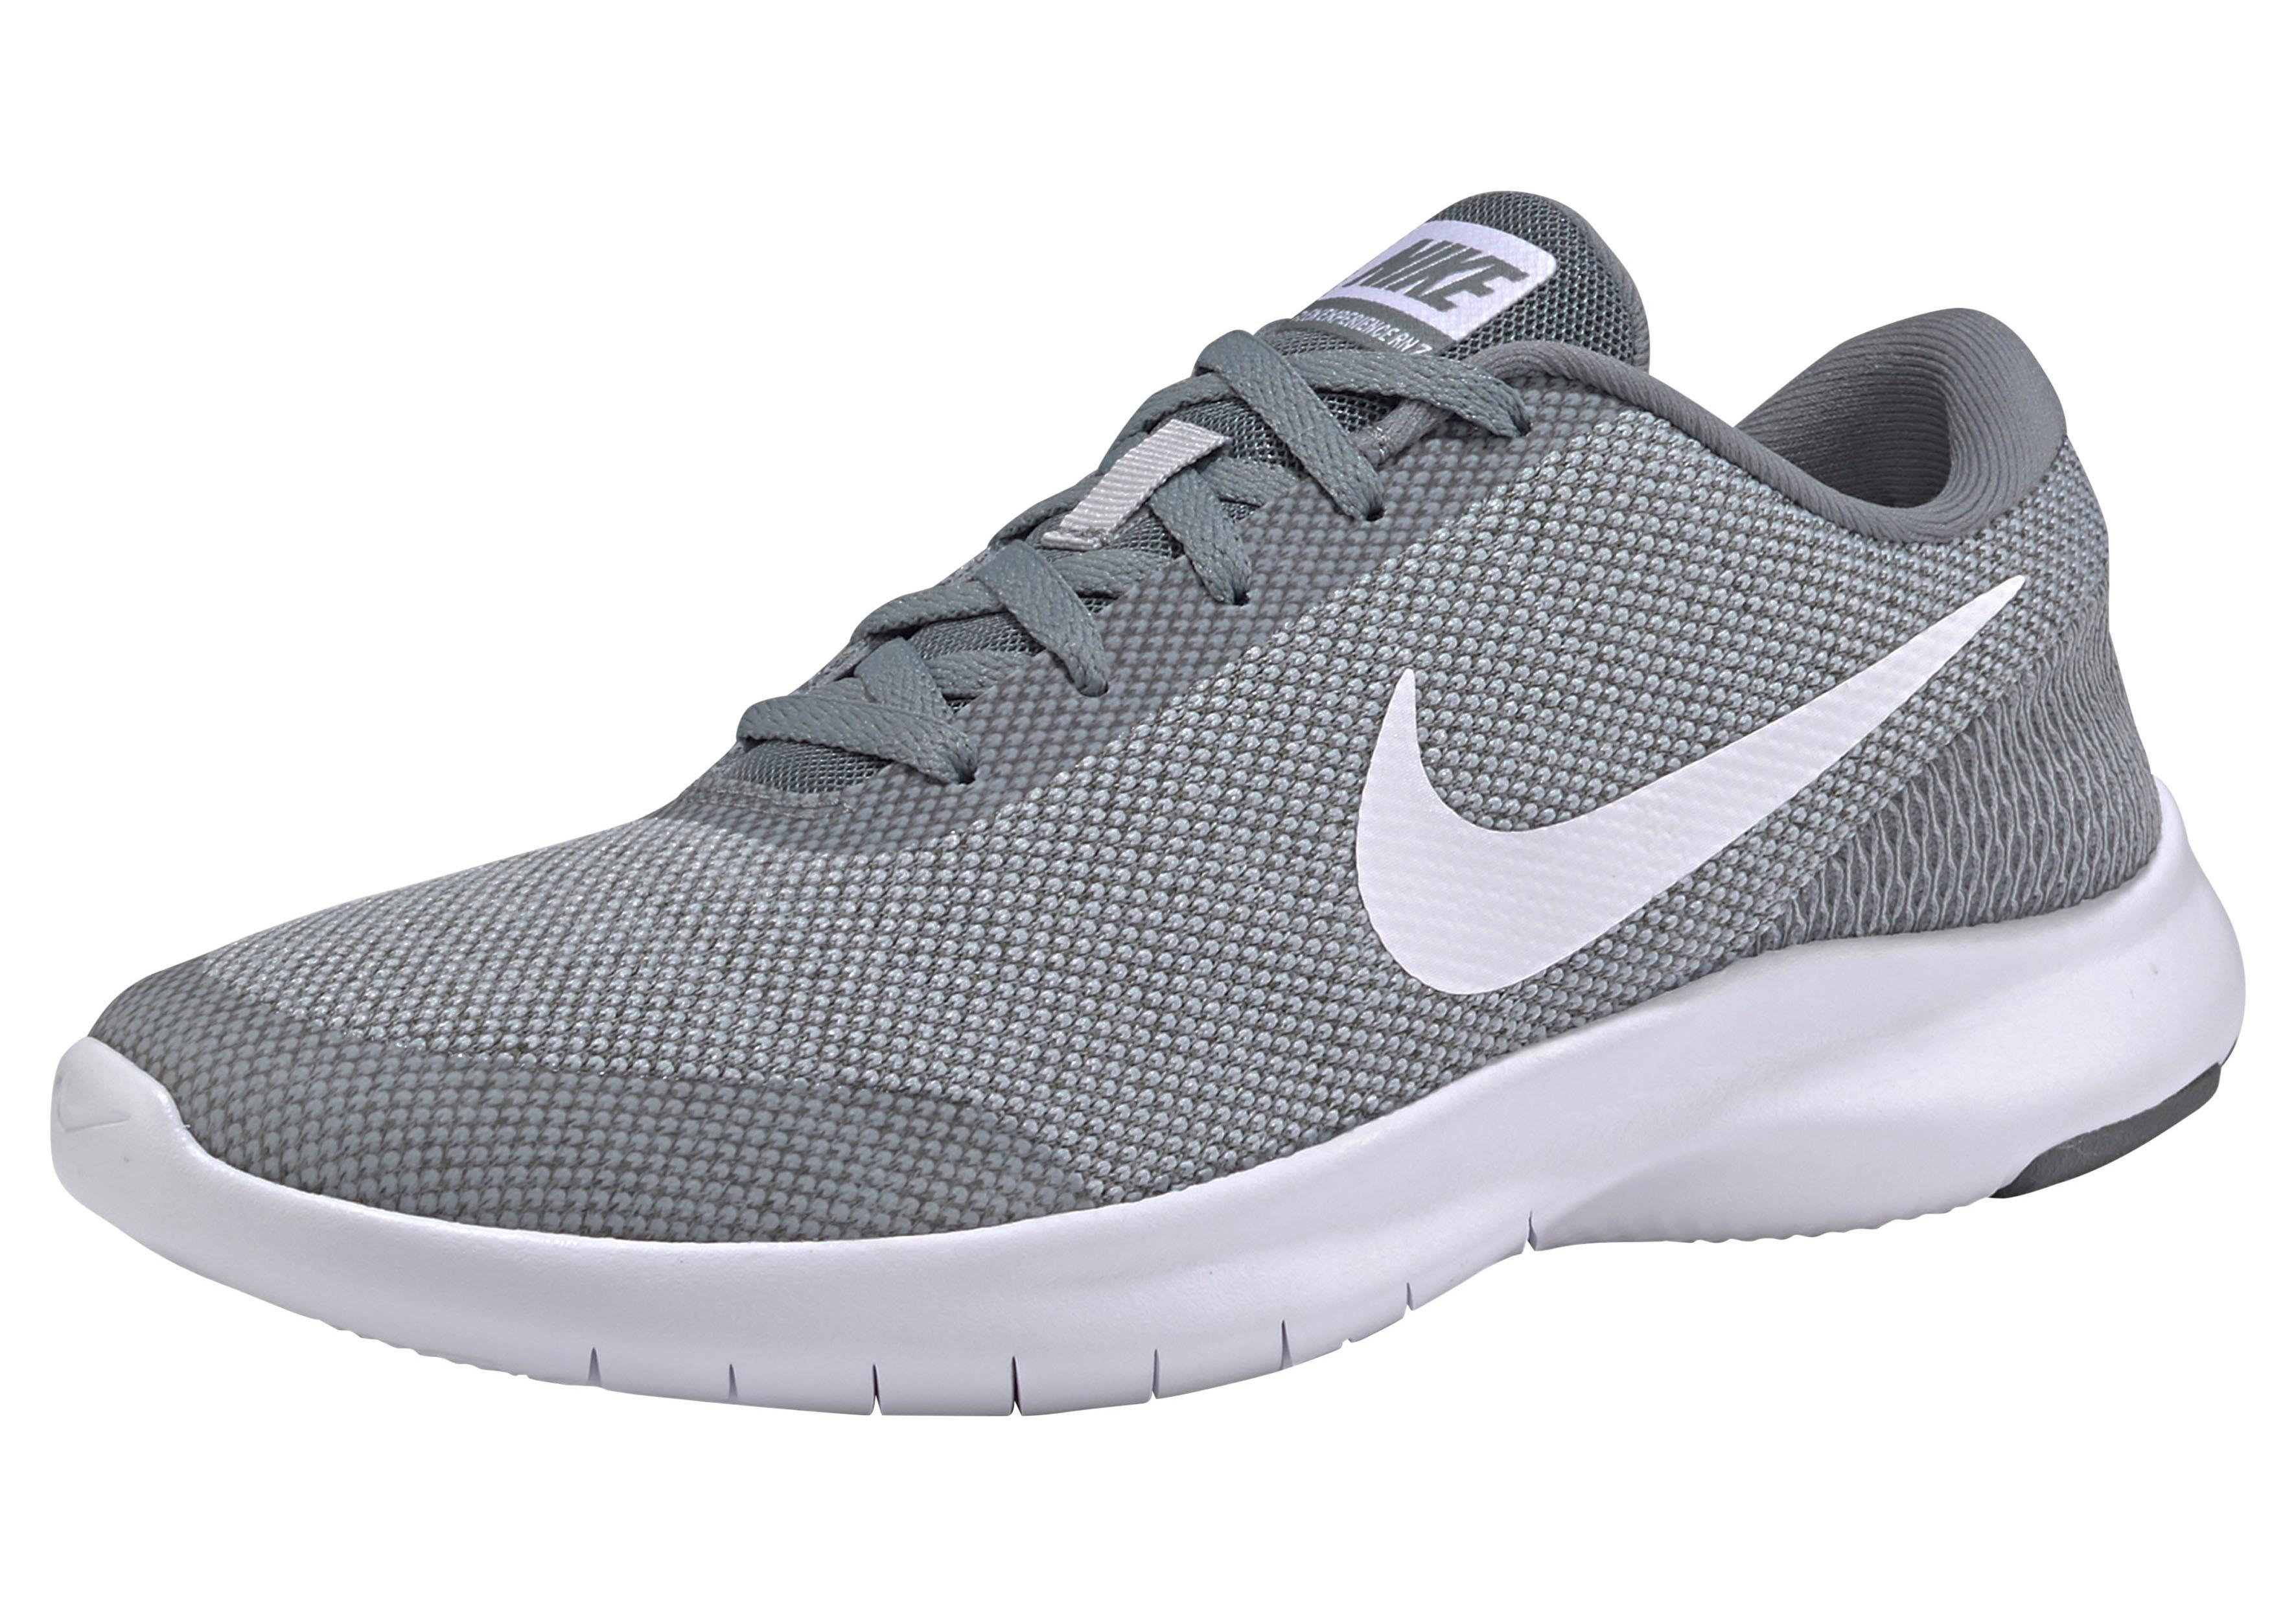 newest collection 6b409 8d4de ... »Wmns Flex Experience Run 8«, adidas sneakers »Asweerun«, Reebok  runningschoenen »Lite W«, adidas Originals, adidas runningschoenen »Duramo  Lite 2.0 W«